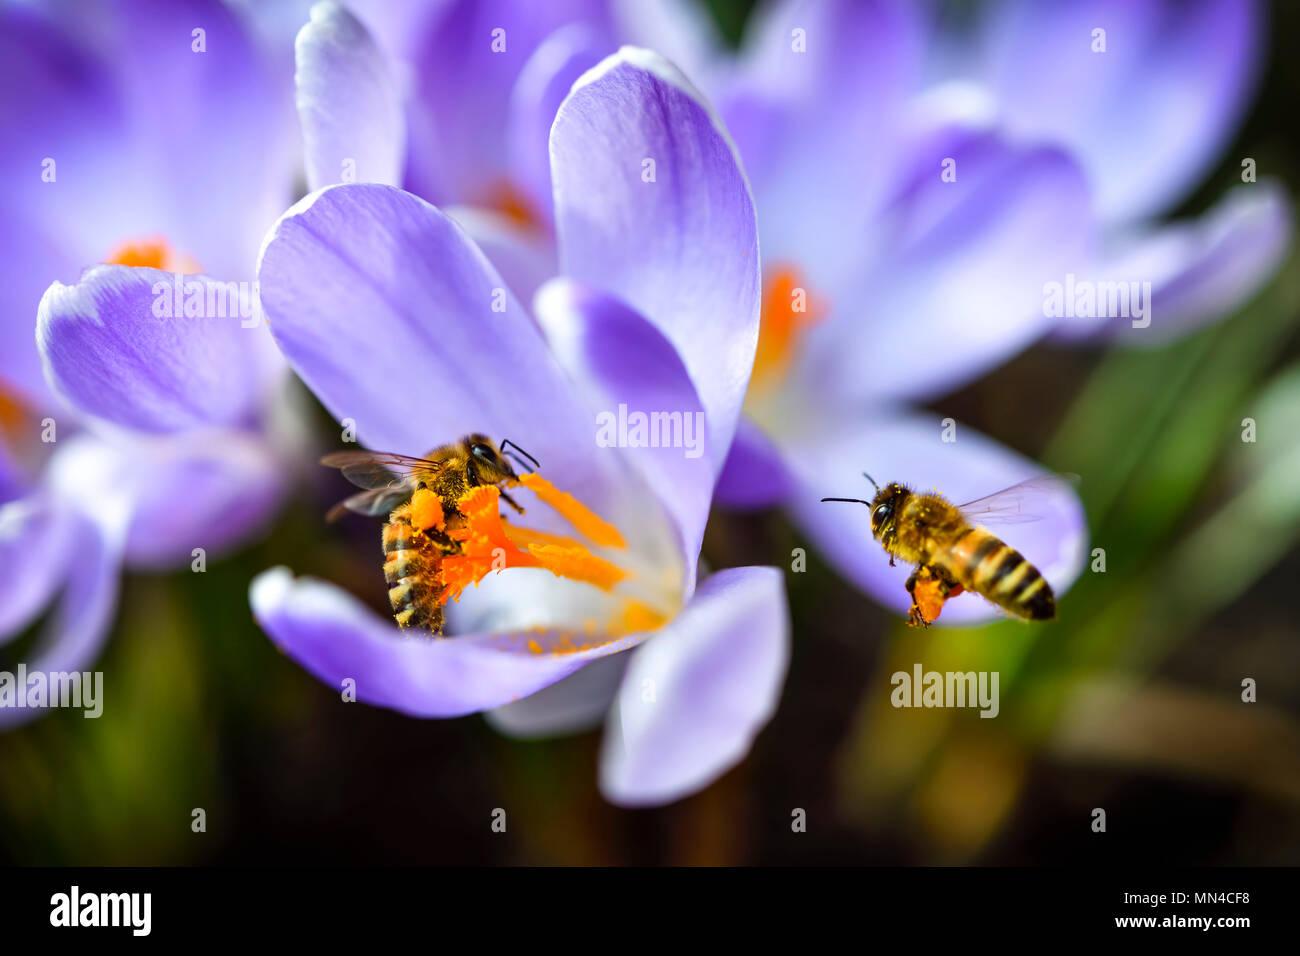 Honey bees (Apis mellifera) on crocus flowers in spring, Honigbienen (Apis mellifera) auf Krokus-Blüten im Frühling Stock Photo